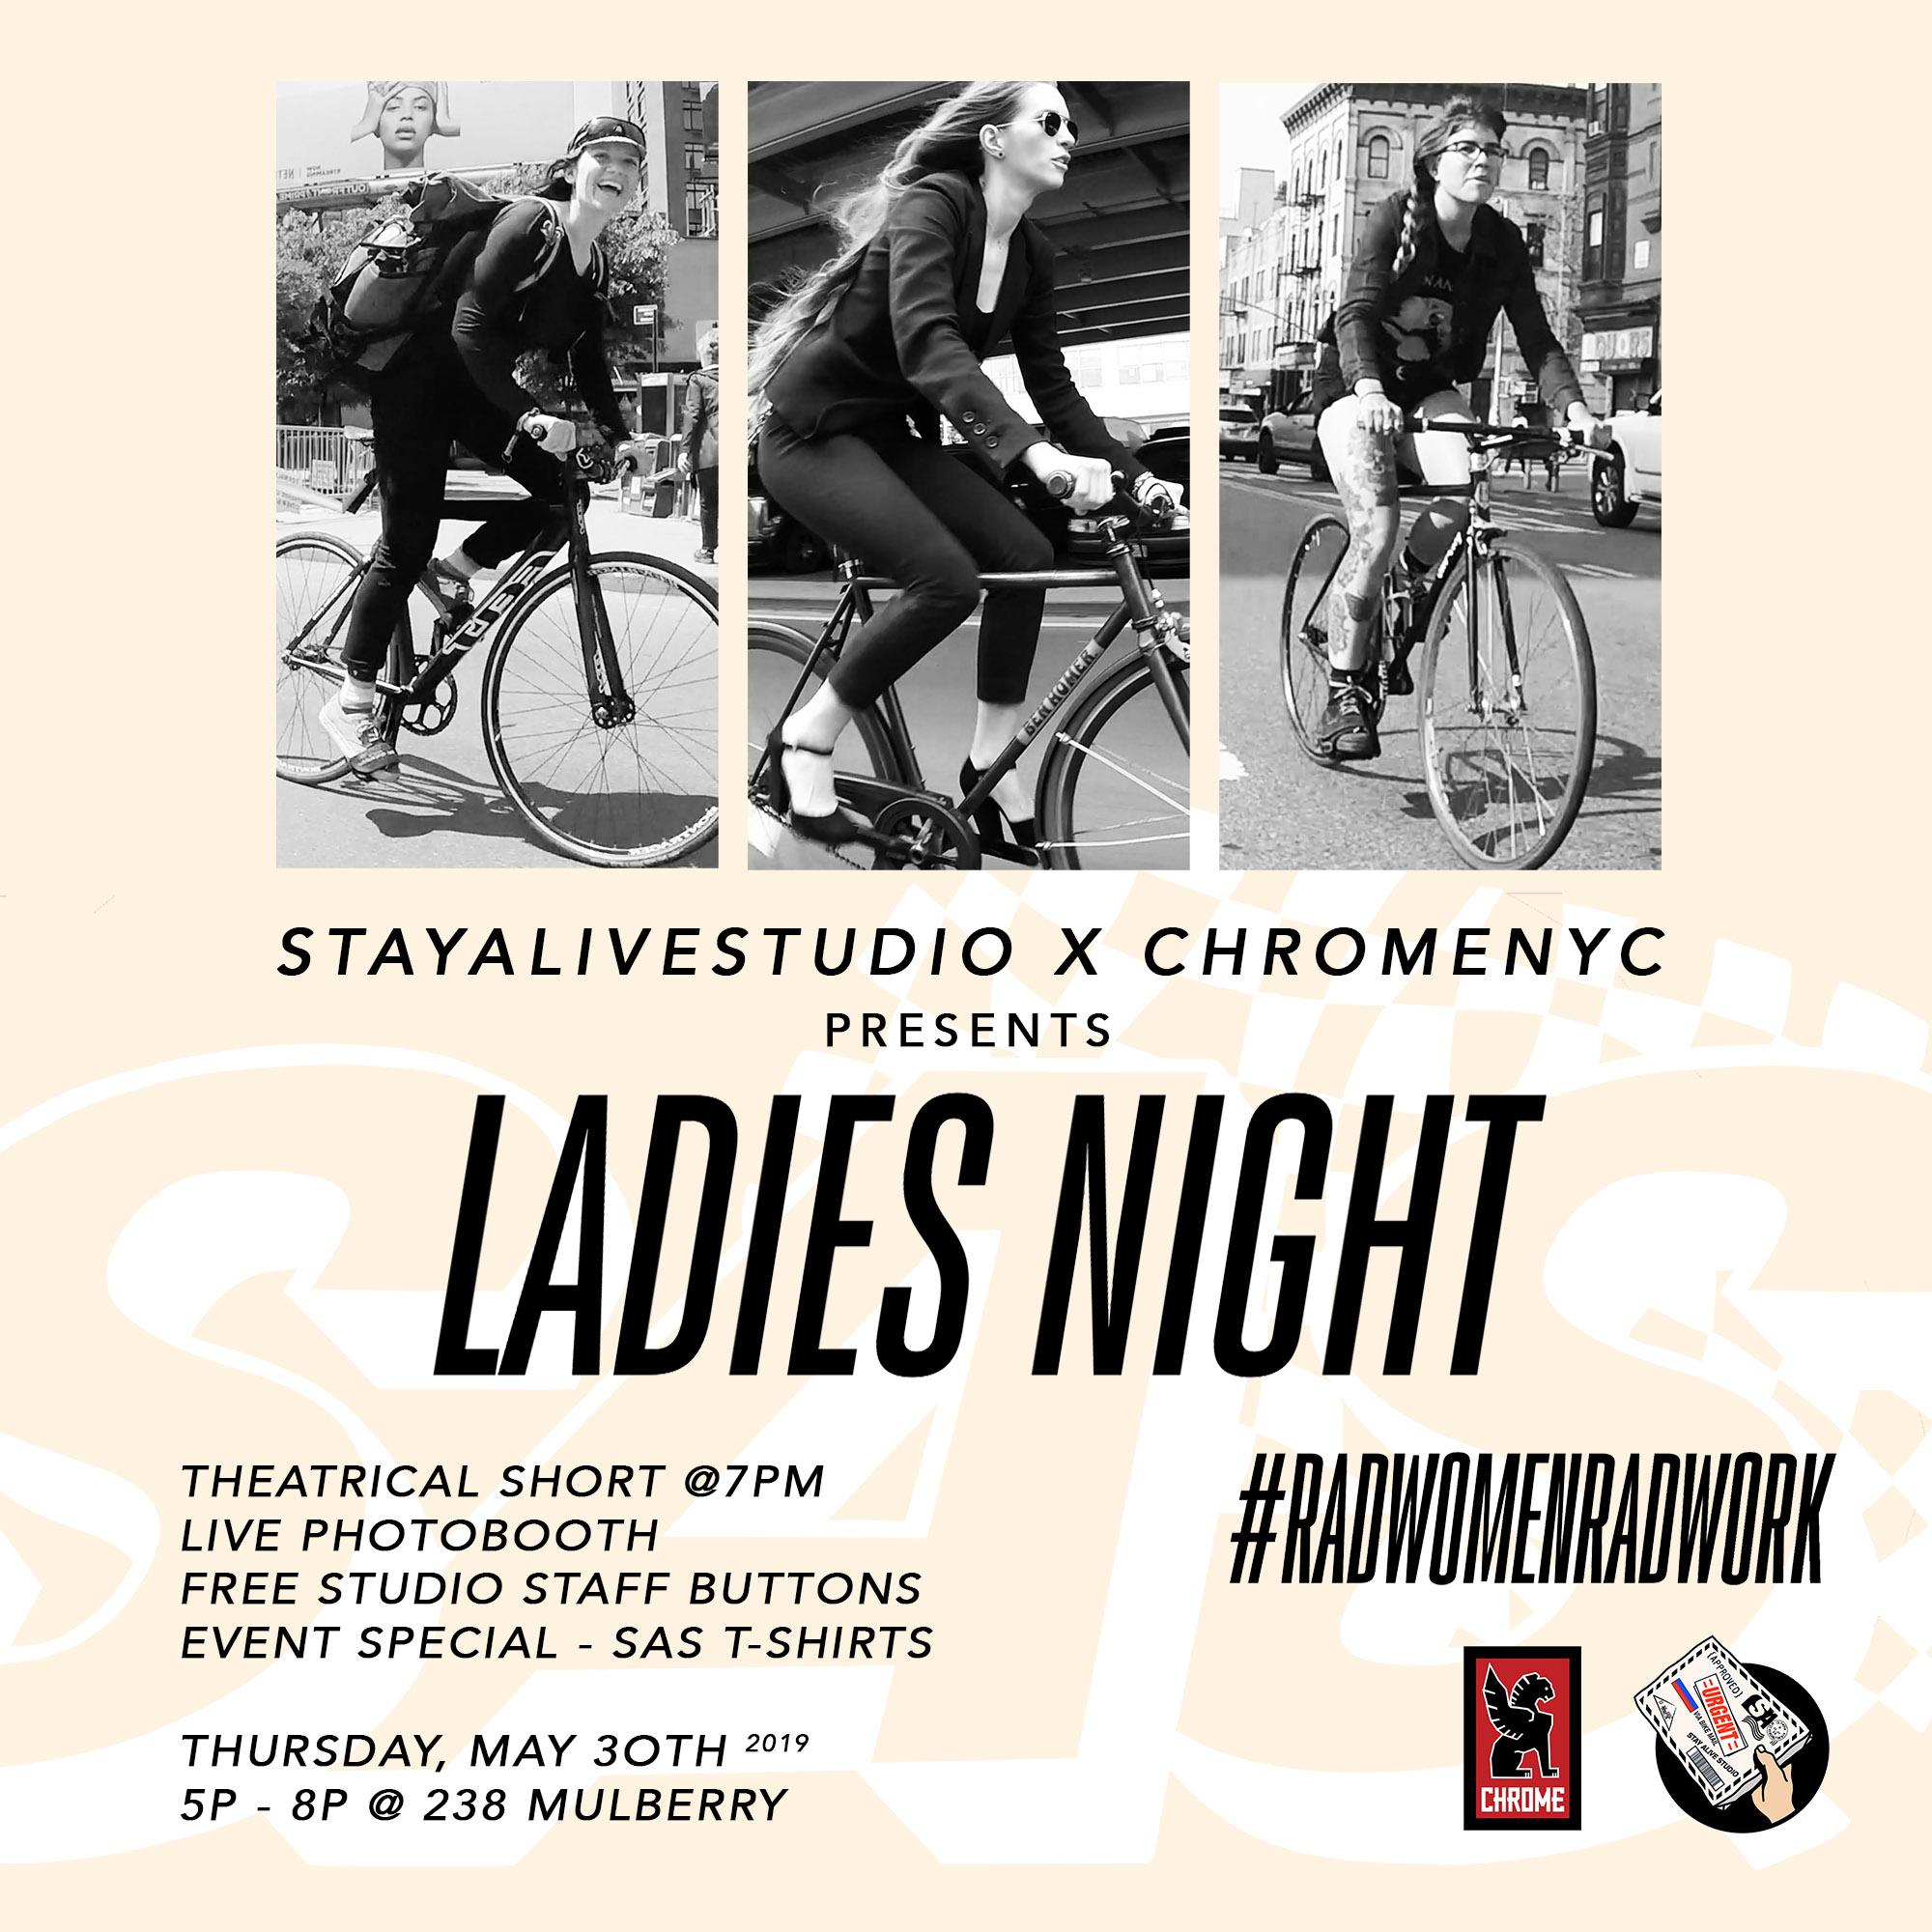 Ladies Night Flyer-small.jpg